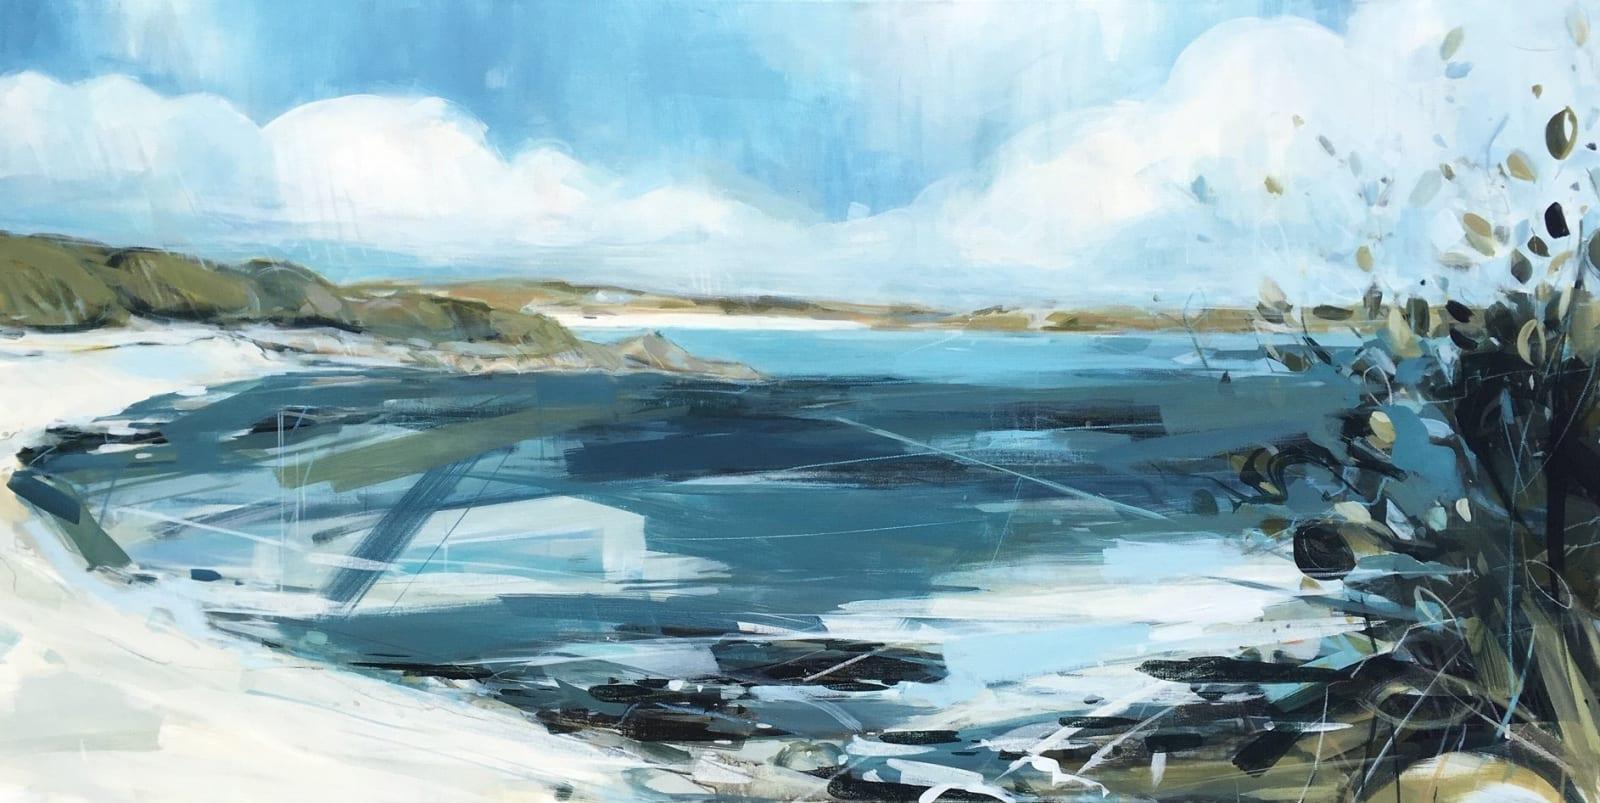 Imogen Bone, Cove of Dreams